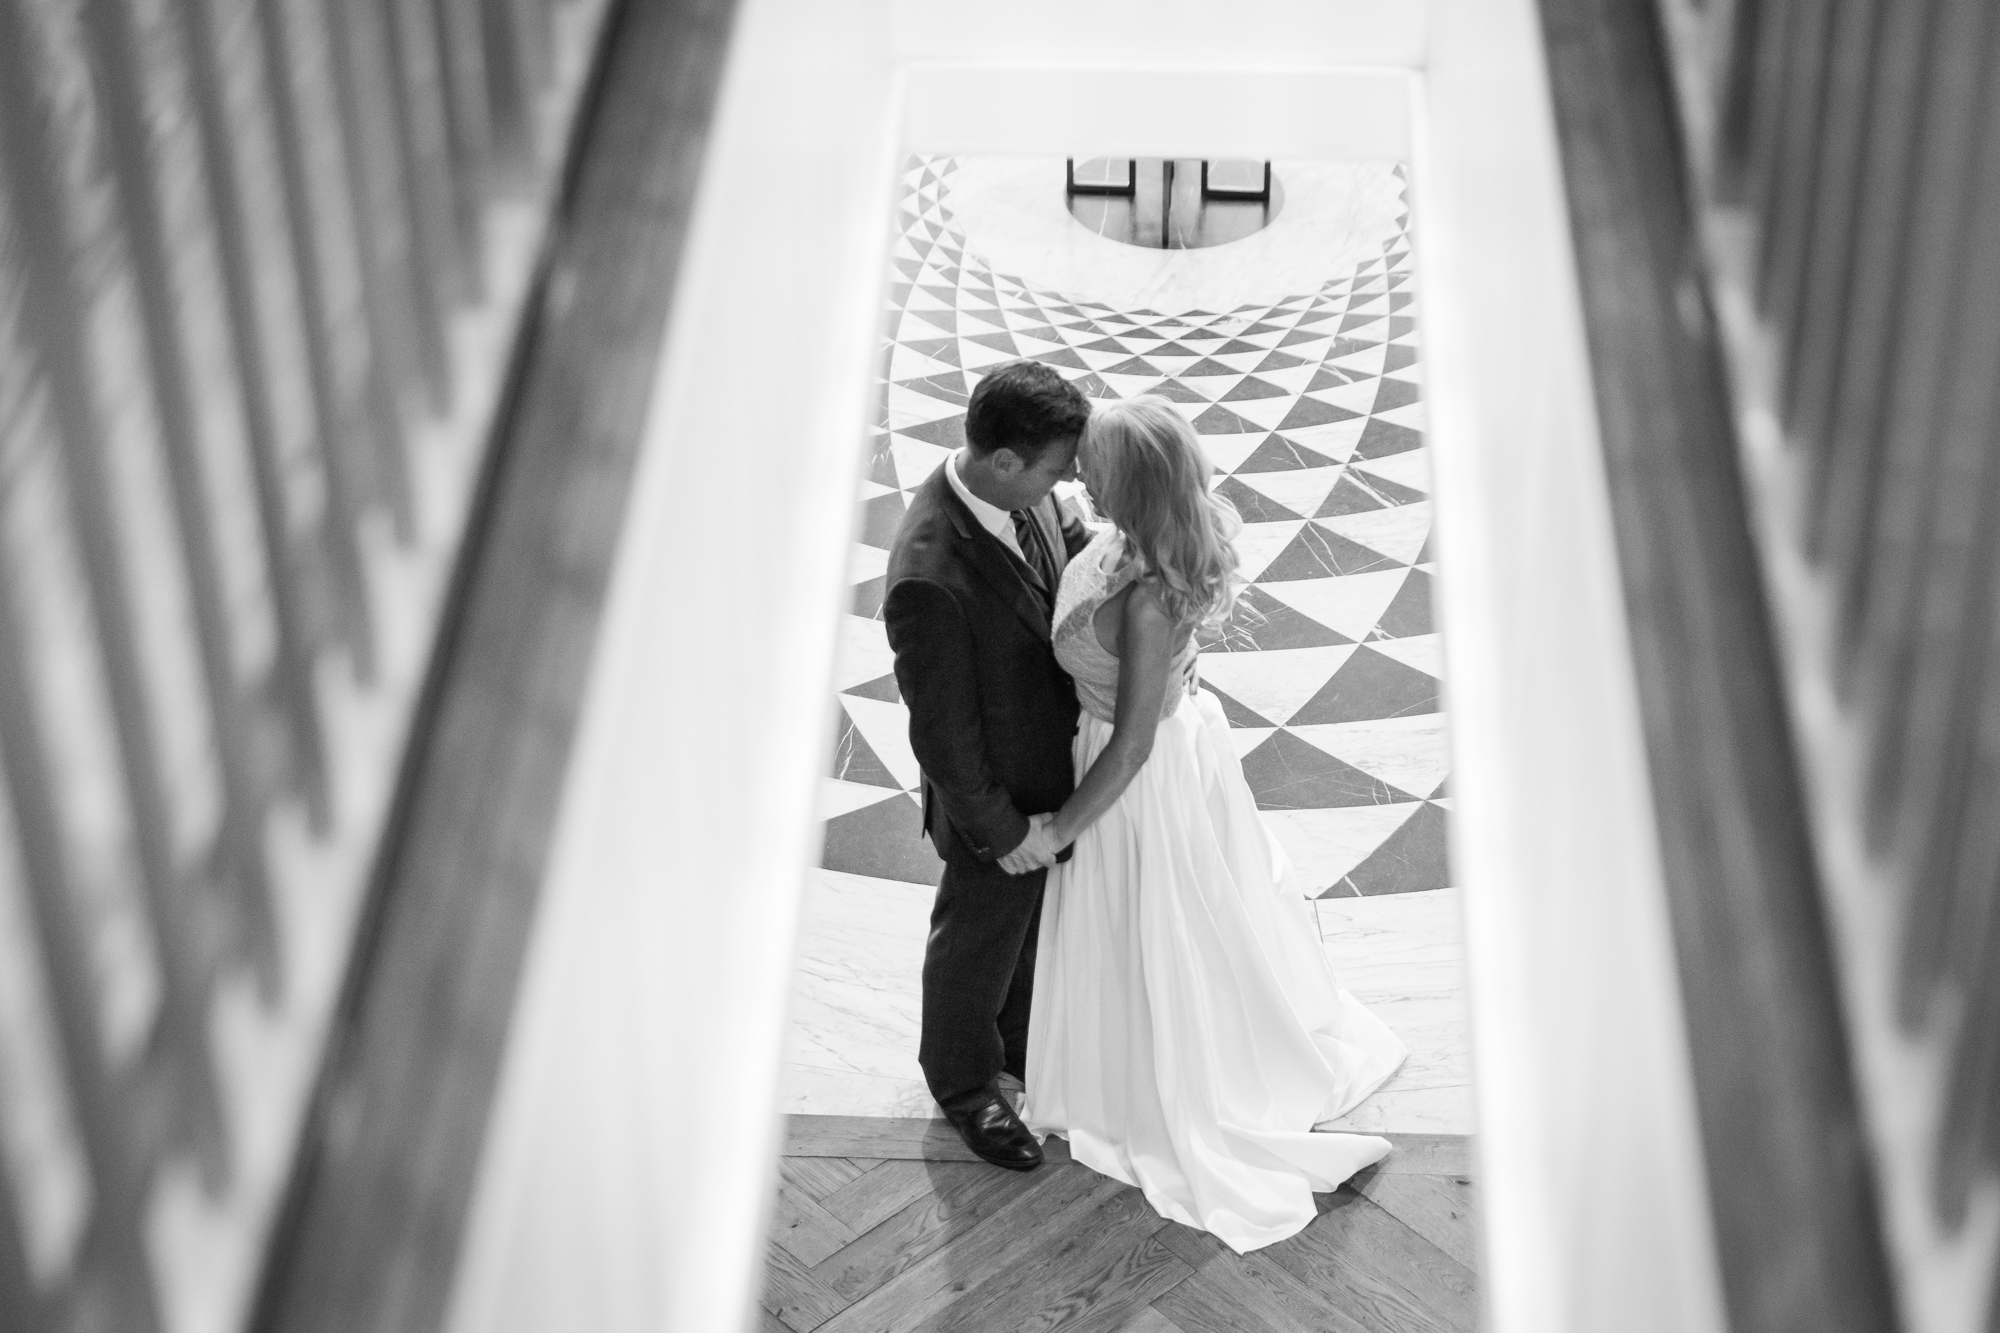 Oxford-Exchange-wedding, Oxford-Exchange-bride-and-groom